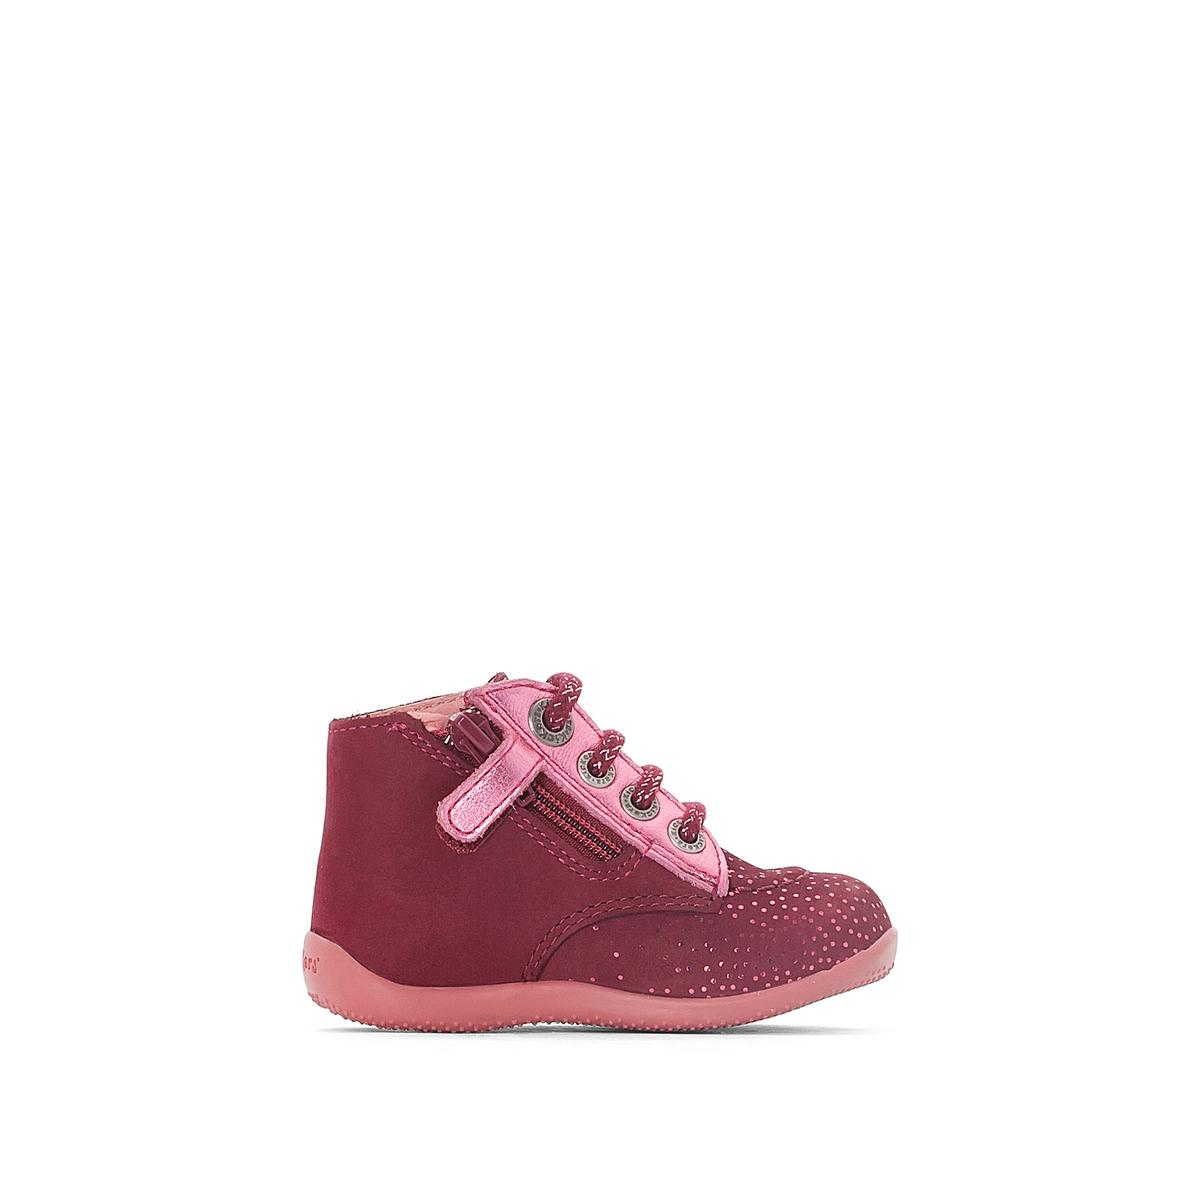 Ботинки кожаные BHOU